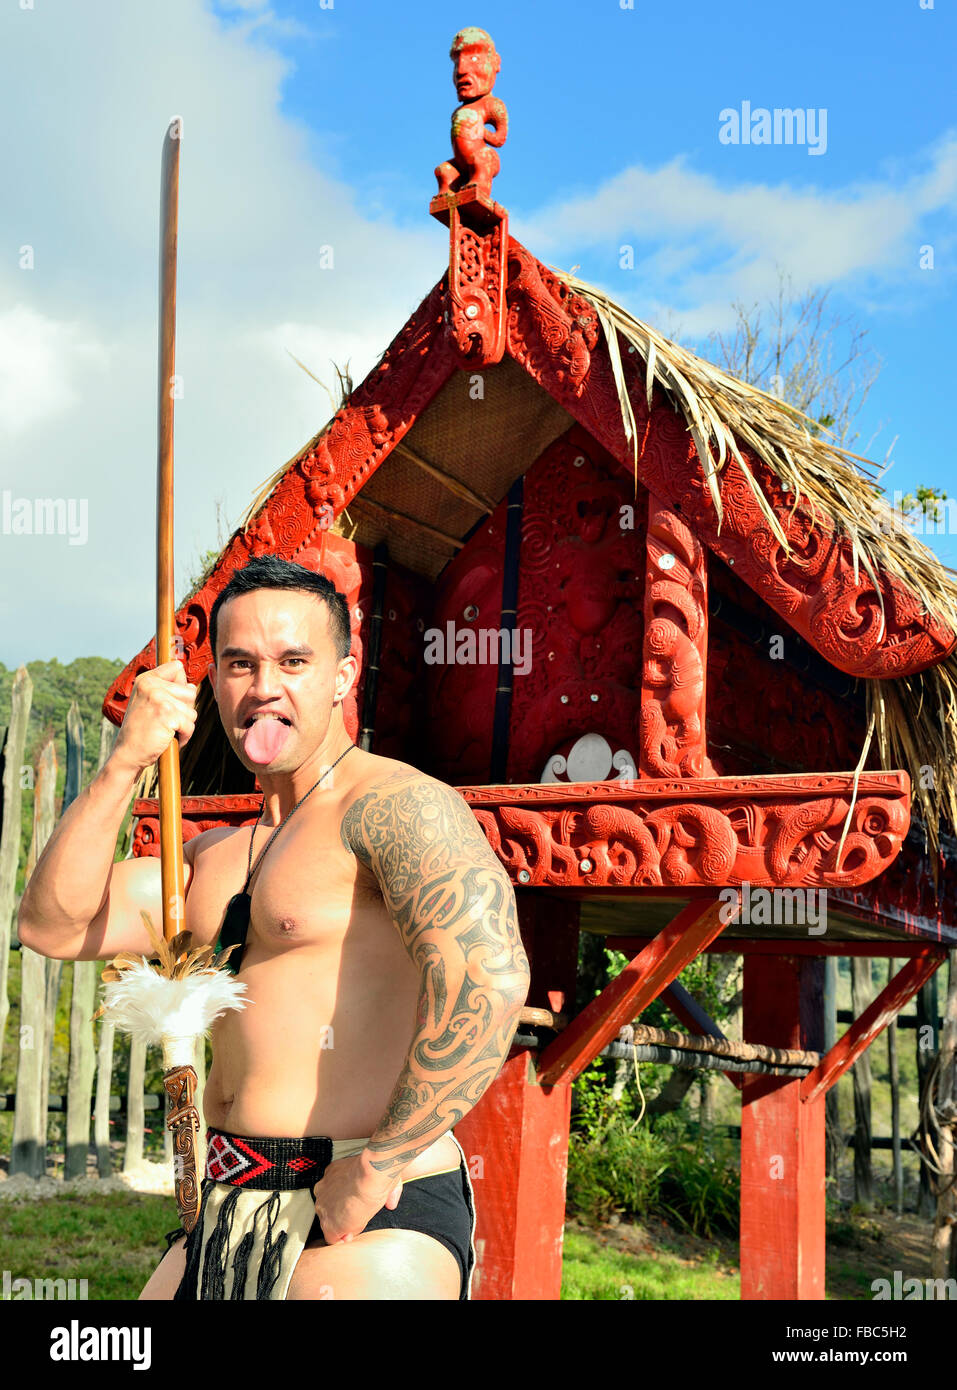 A Maori warrior troupe member at Te Puia .performs a war haka with a spear at  Rotorua s New Zealand's Maori tourist Stock Photo